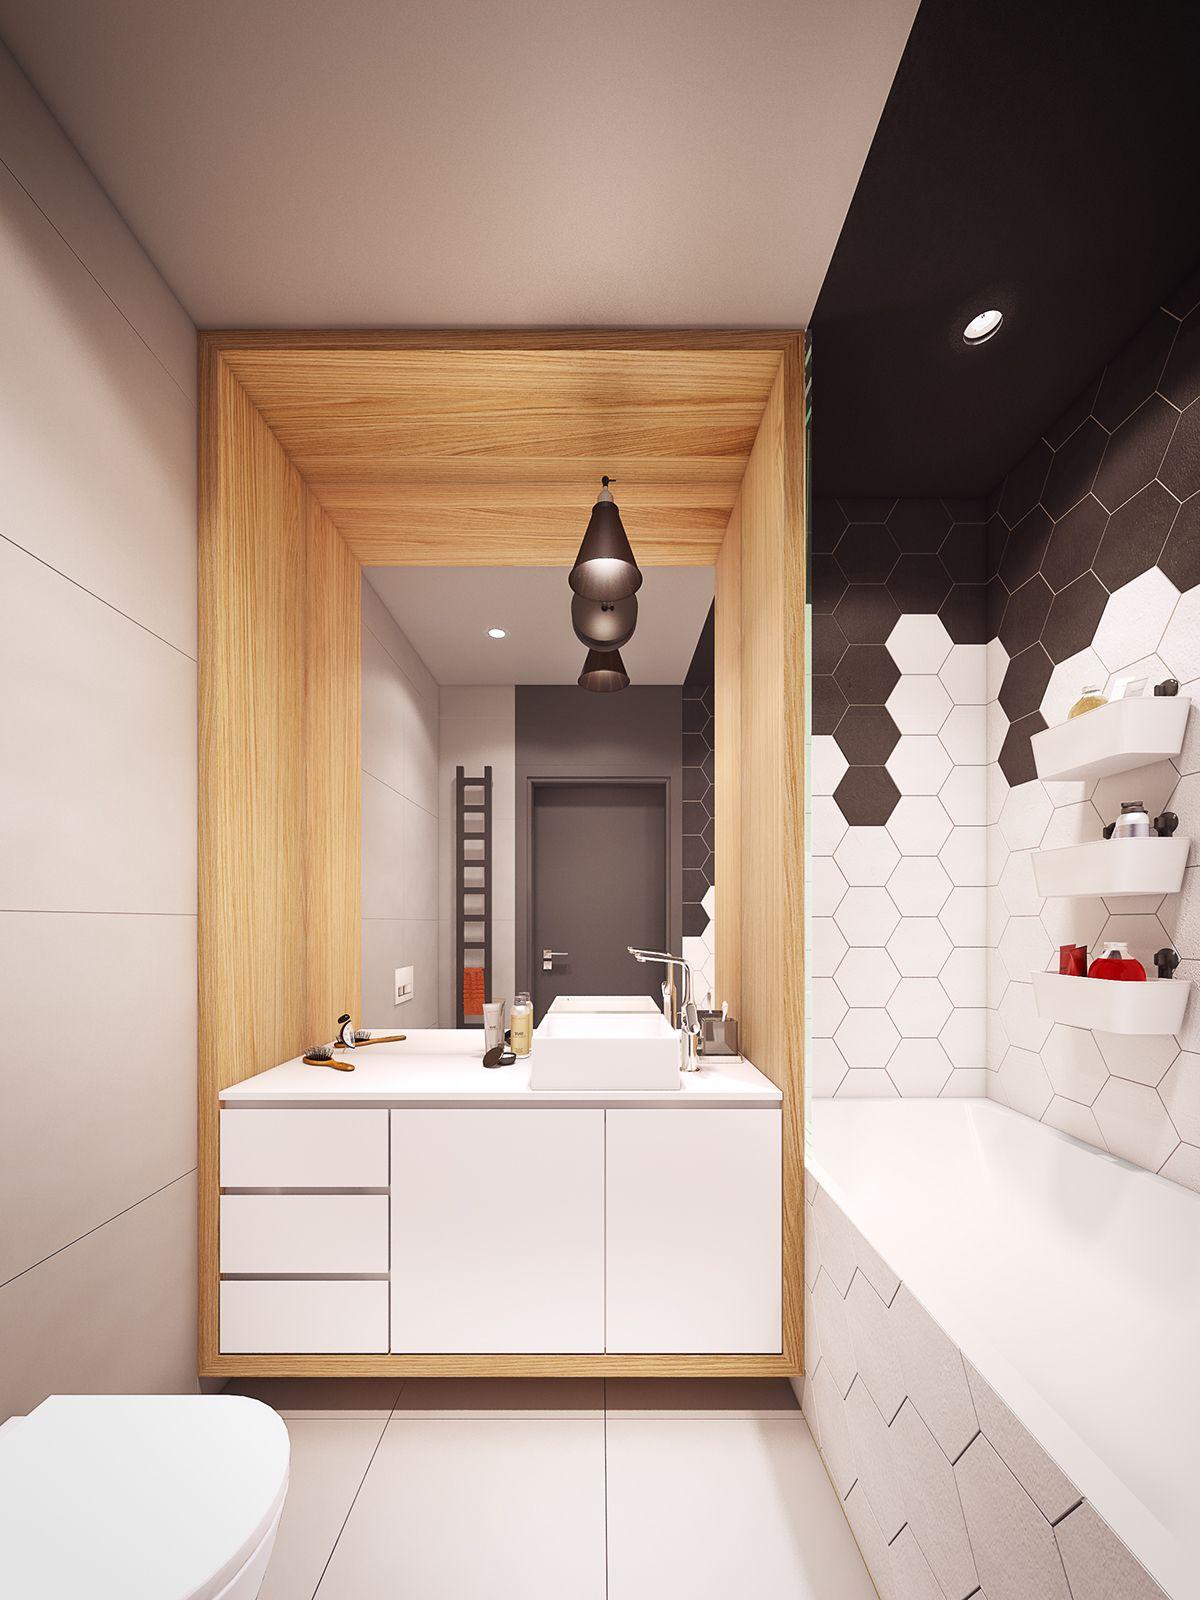 Next Lifetime // Warszawa On Behance   Home Decor Inspired By Color   Home  Decor Inspired By Color